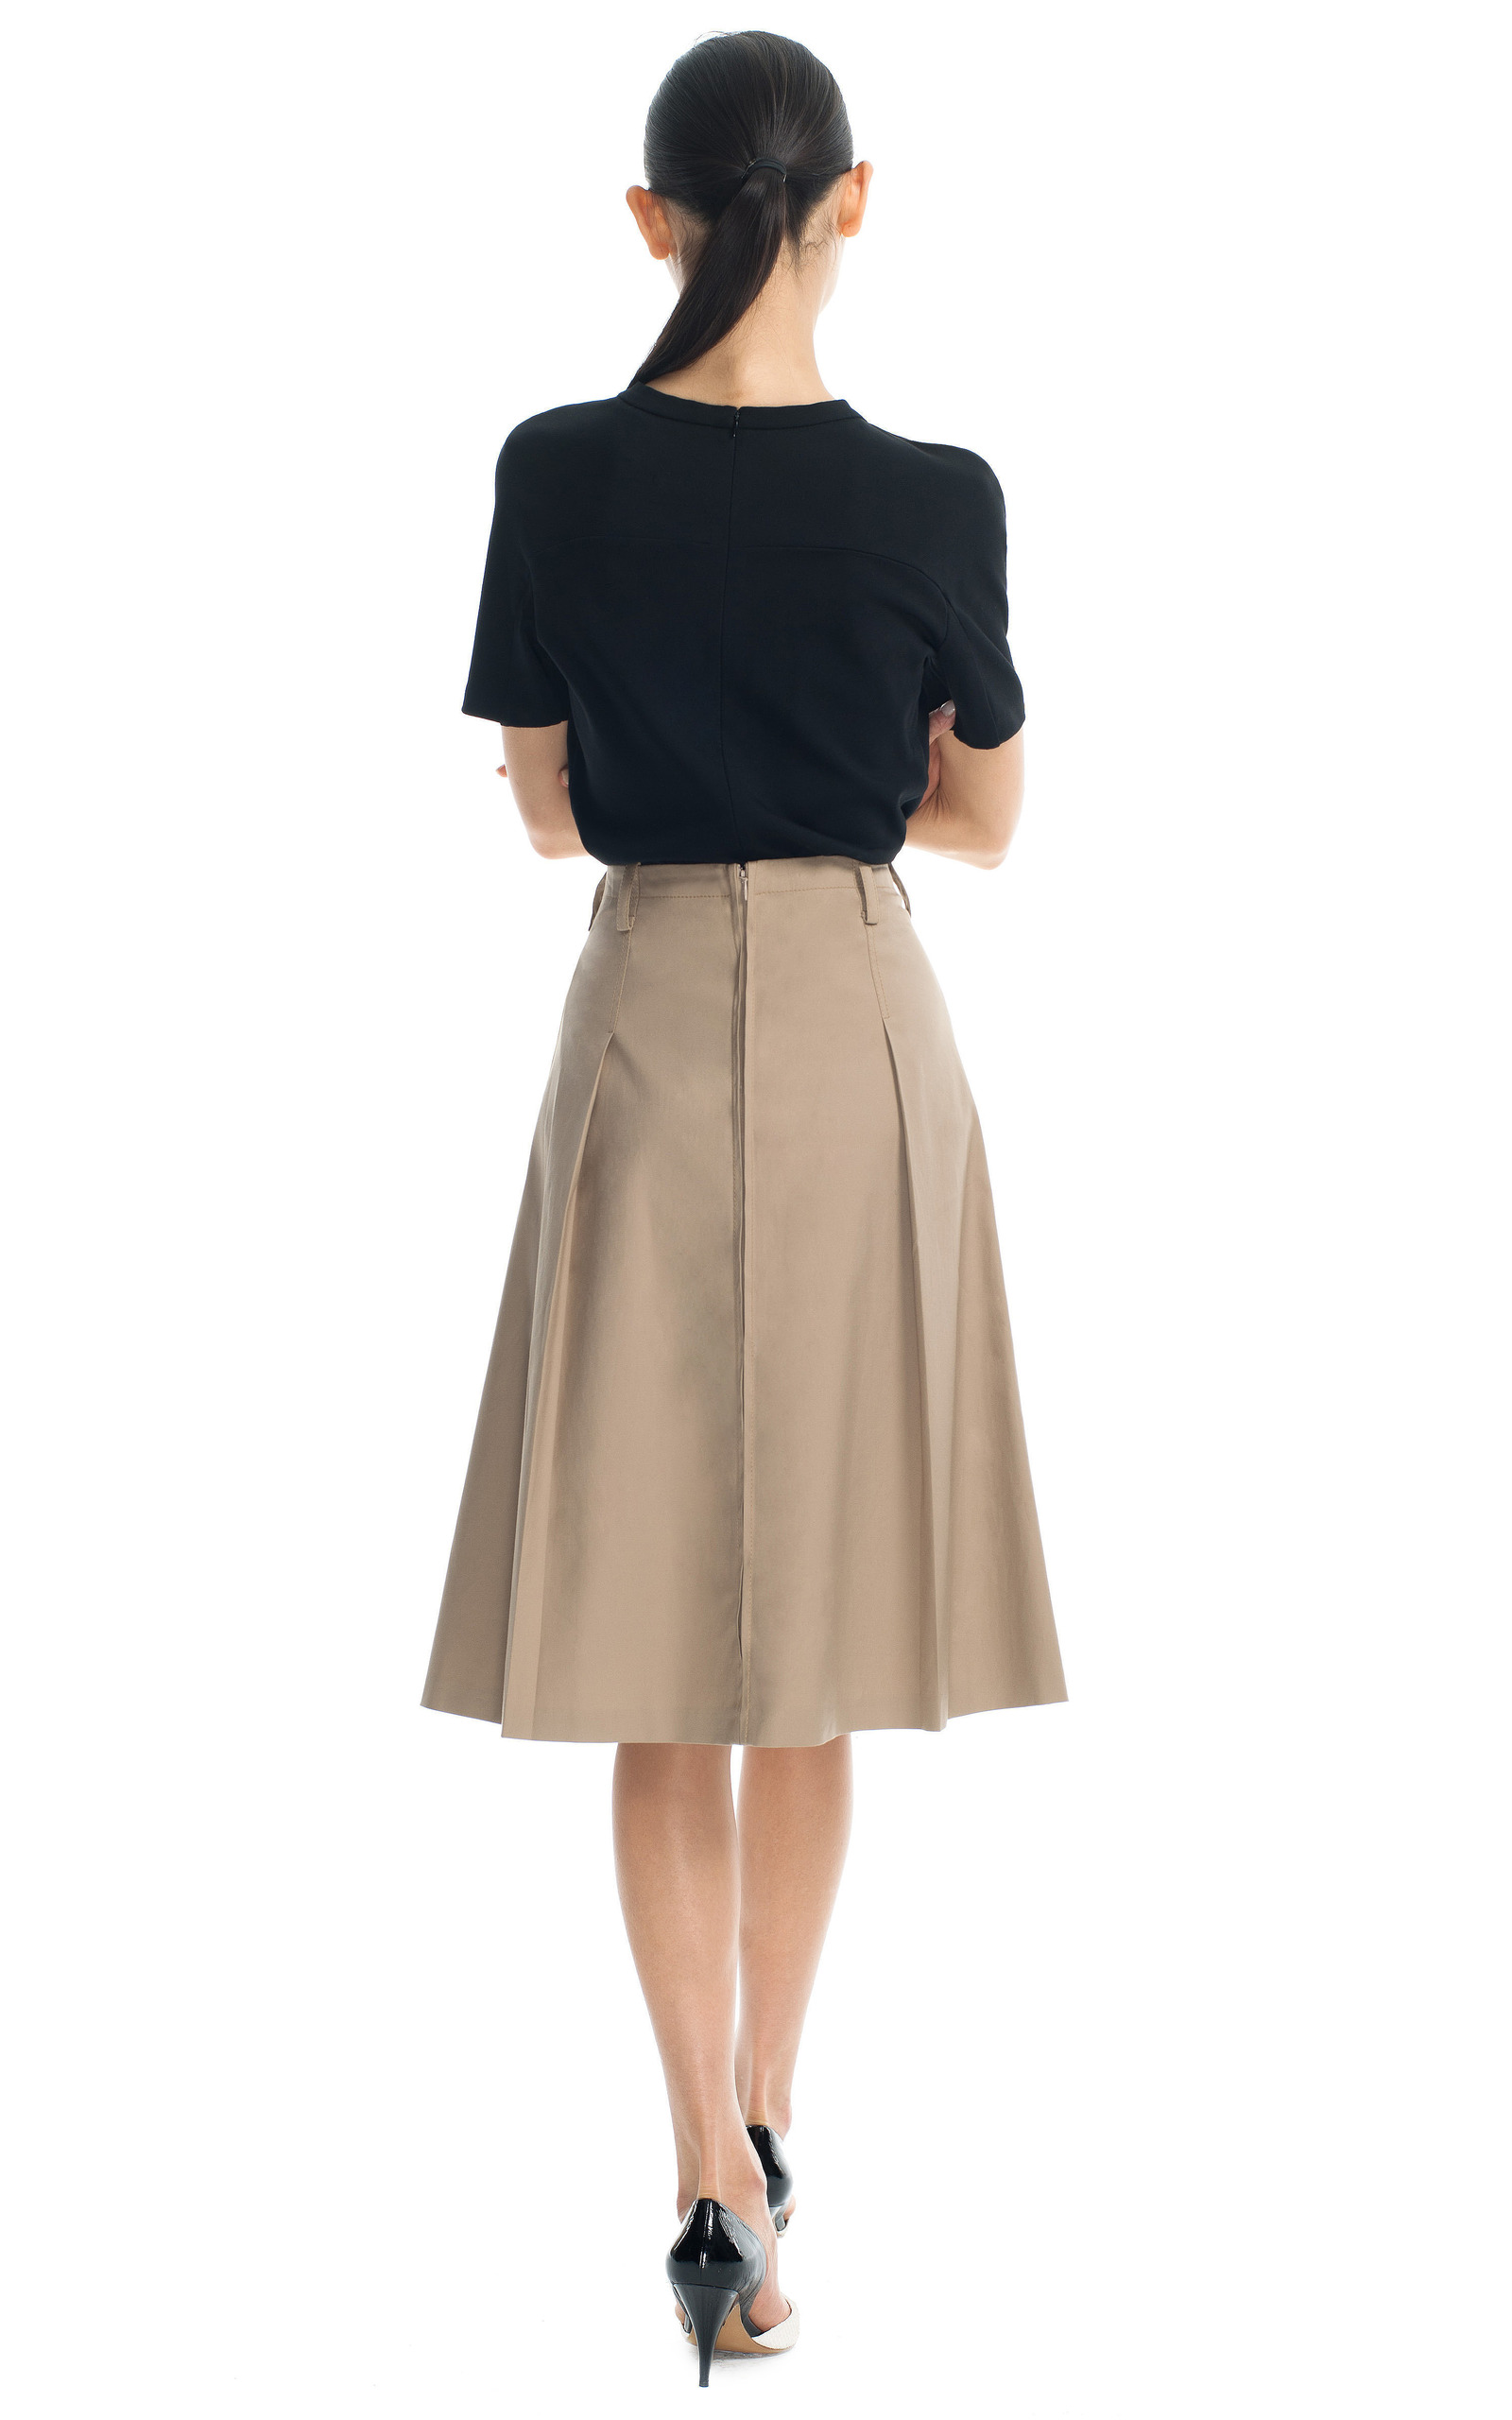 19be22bdd4 Umbrella Box Pleat Skirt by 3.1 Phillip Lim | Moda Operandi